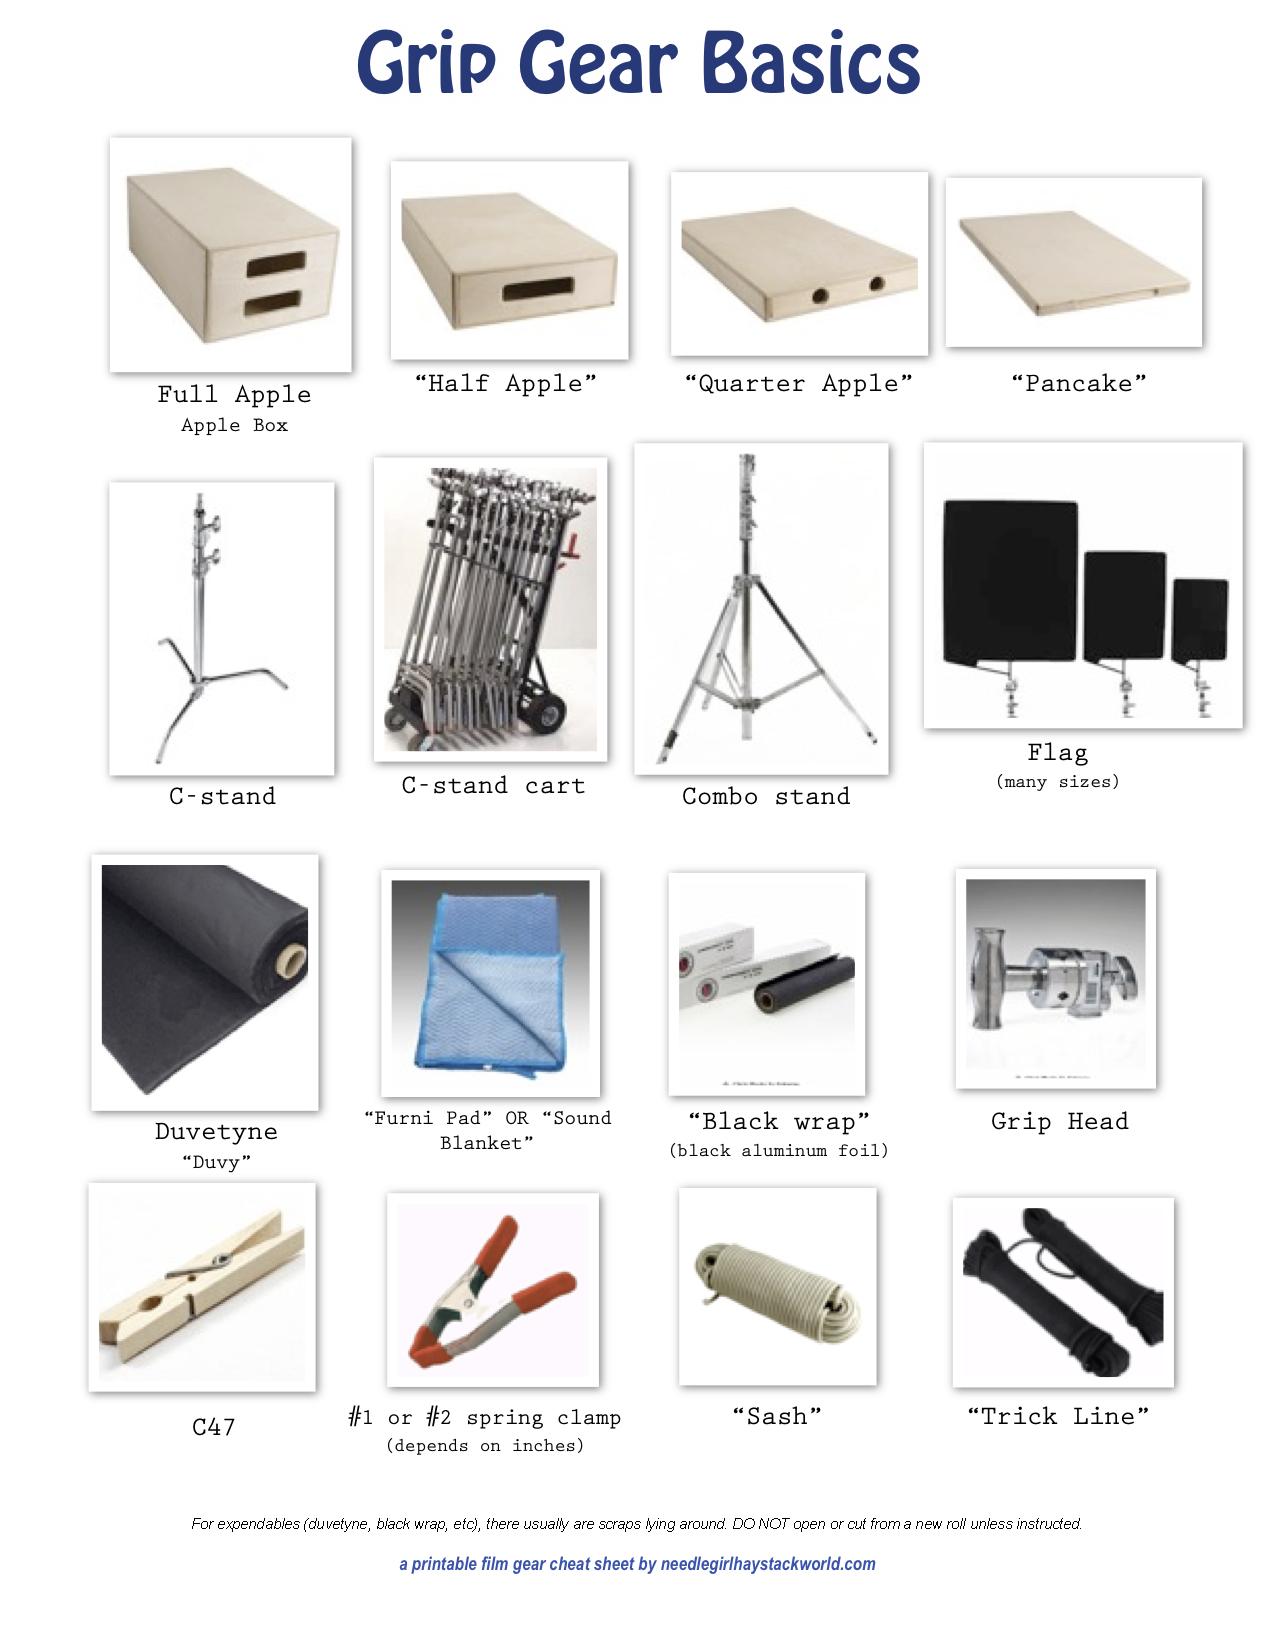 Printable Film Guide: Grip Gear Basics